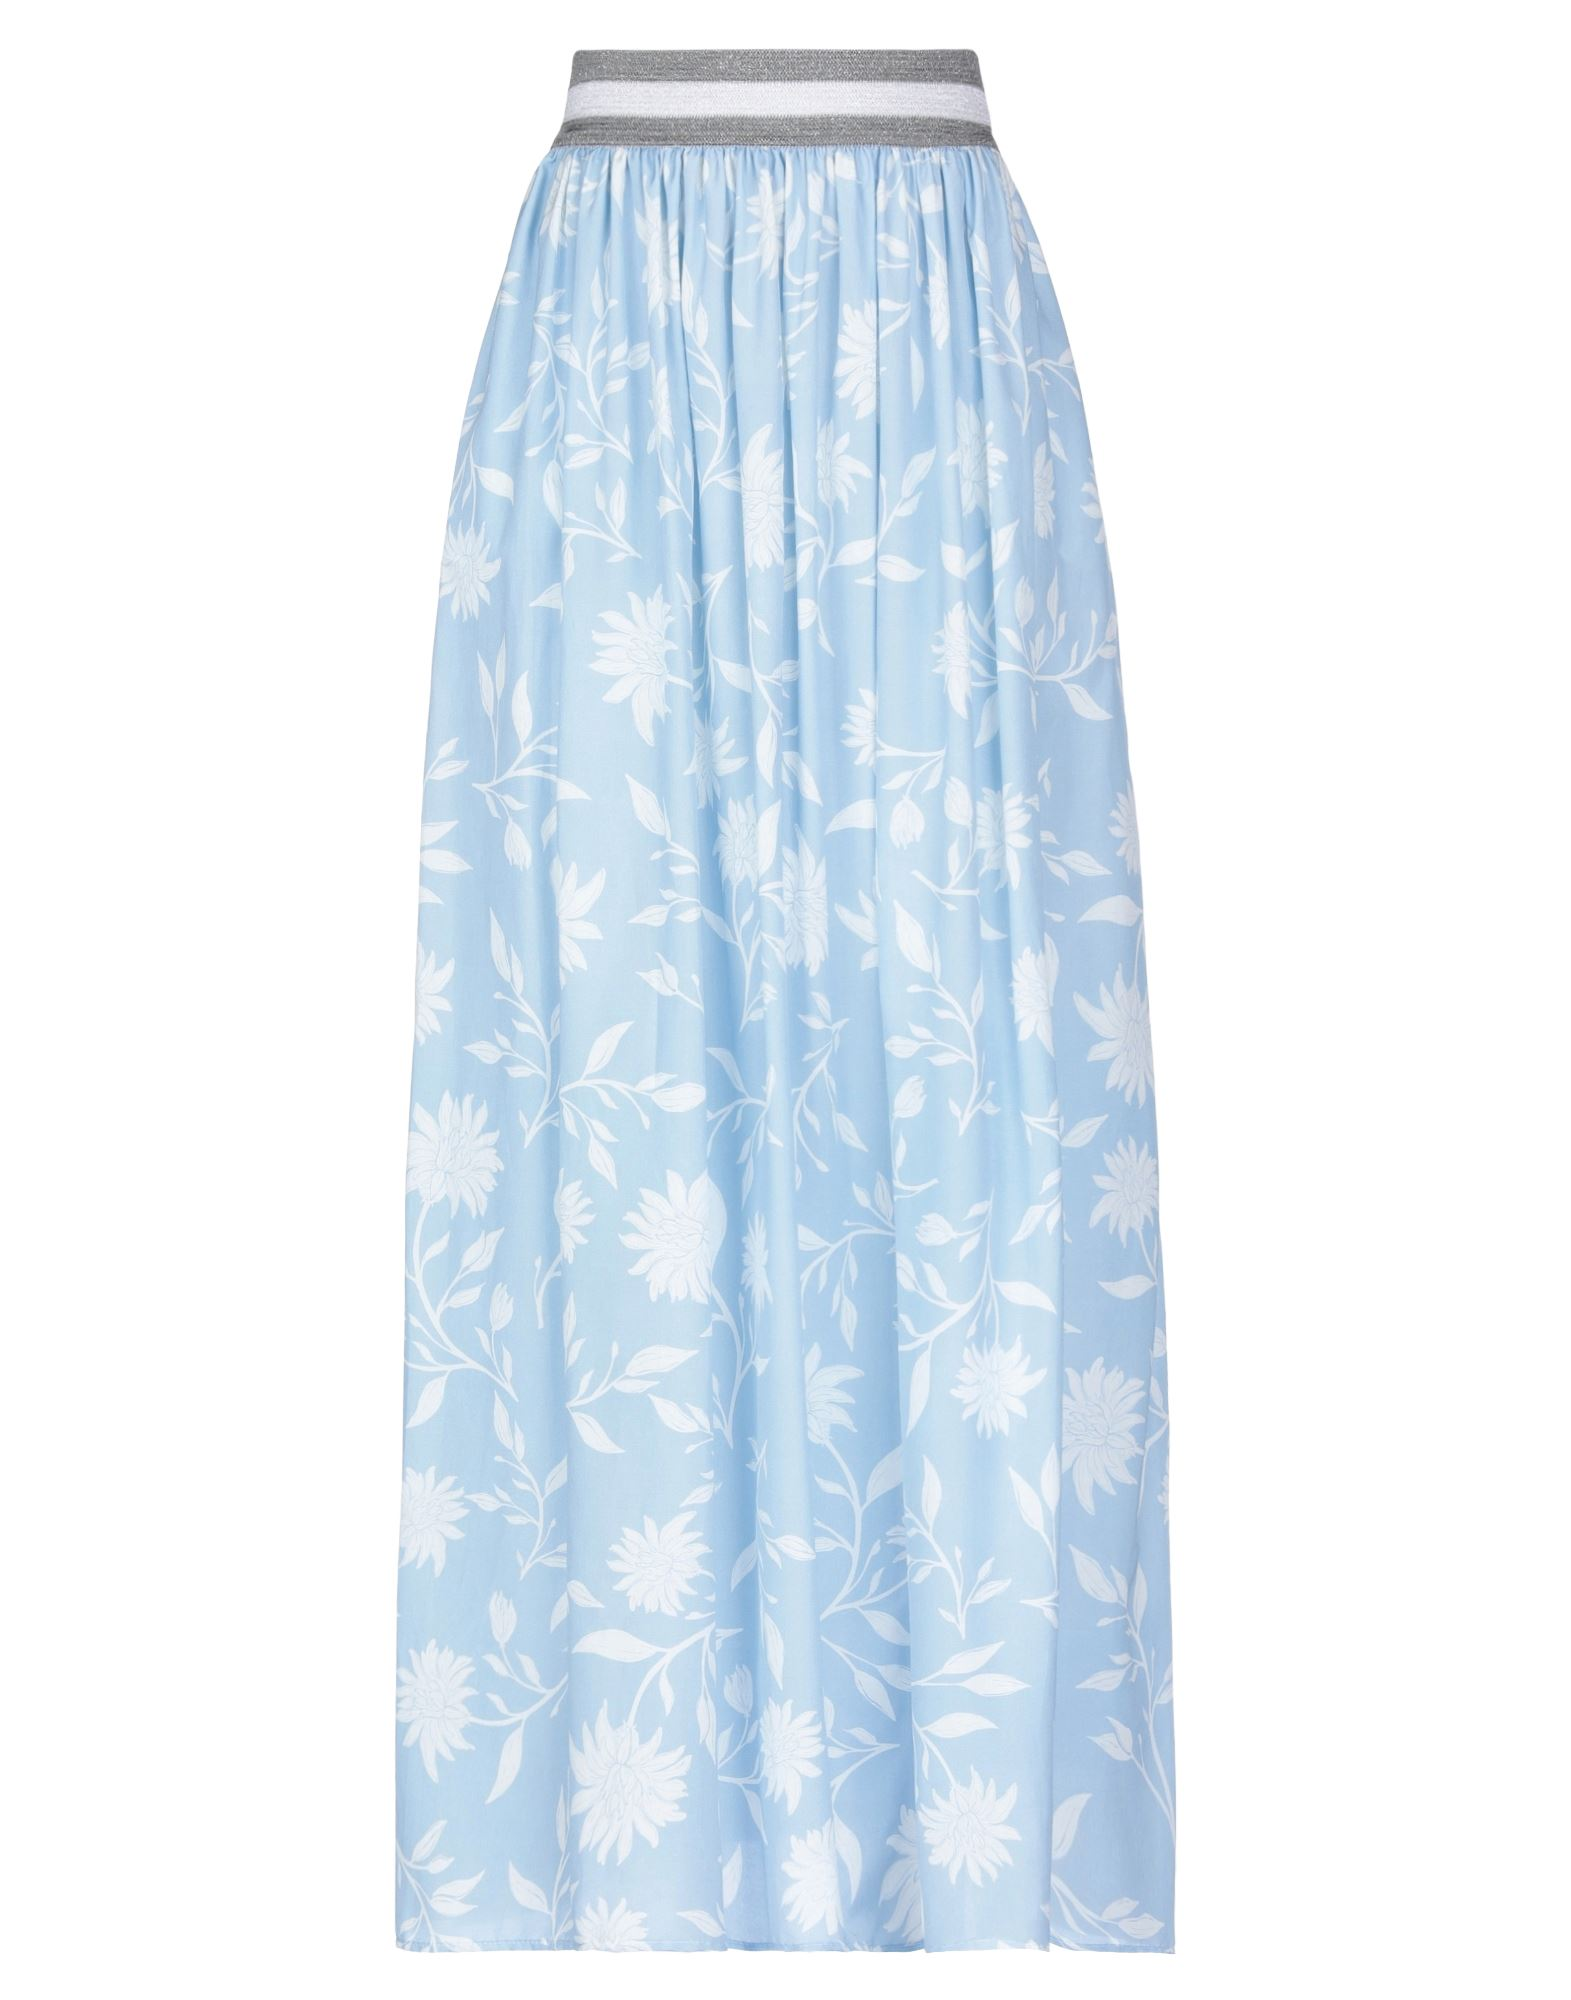 Фото - BIANCALANCIA Длинная юбка biancalancia накидка